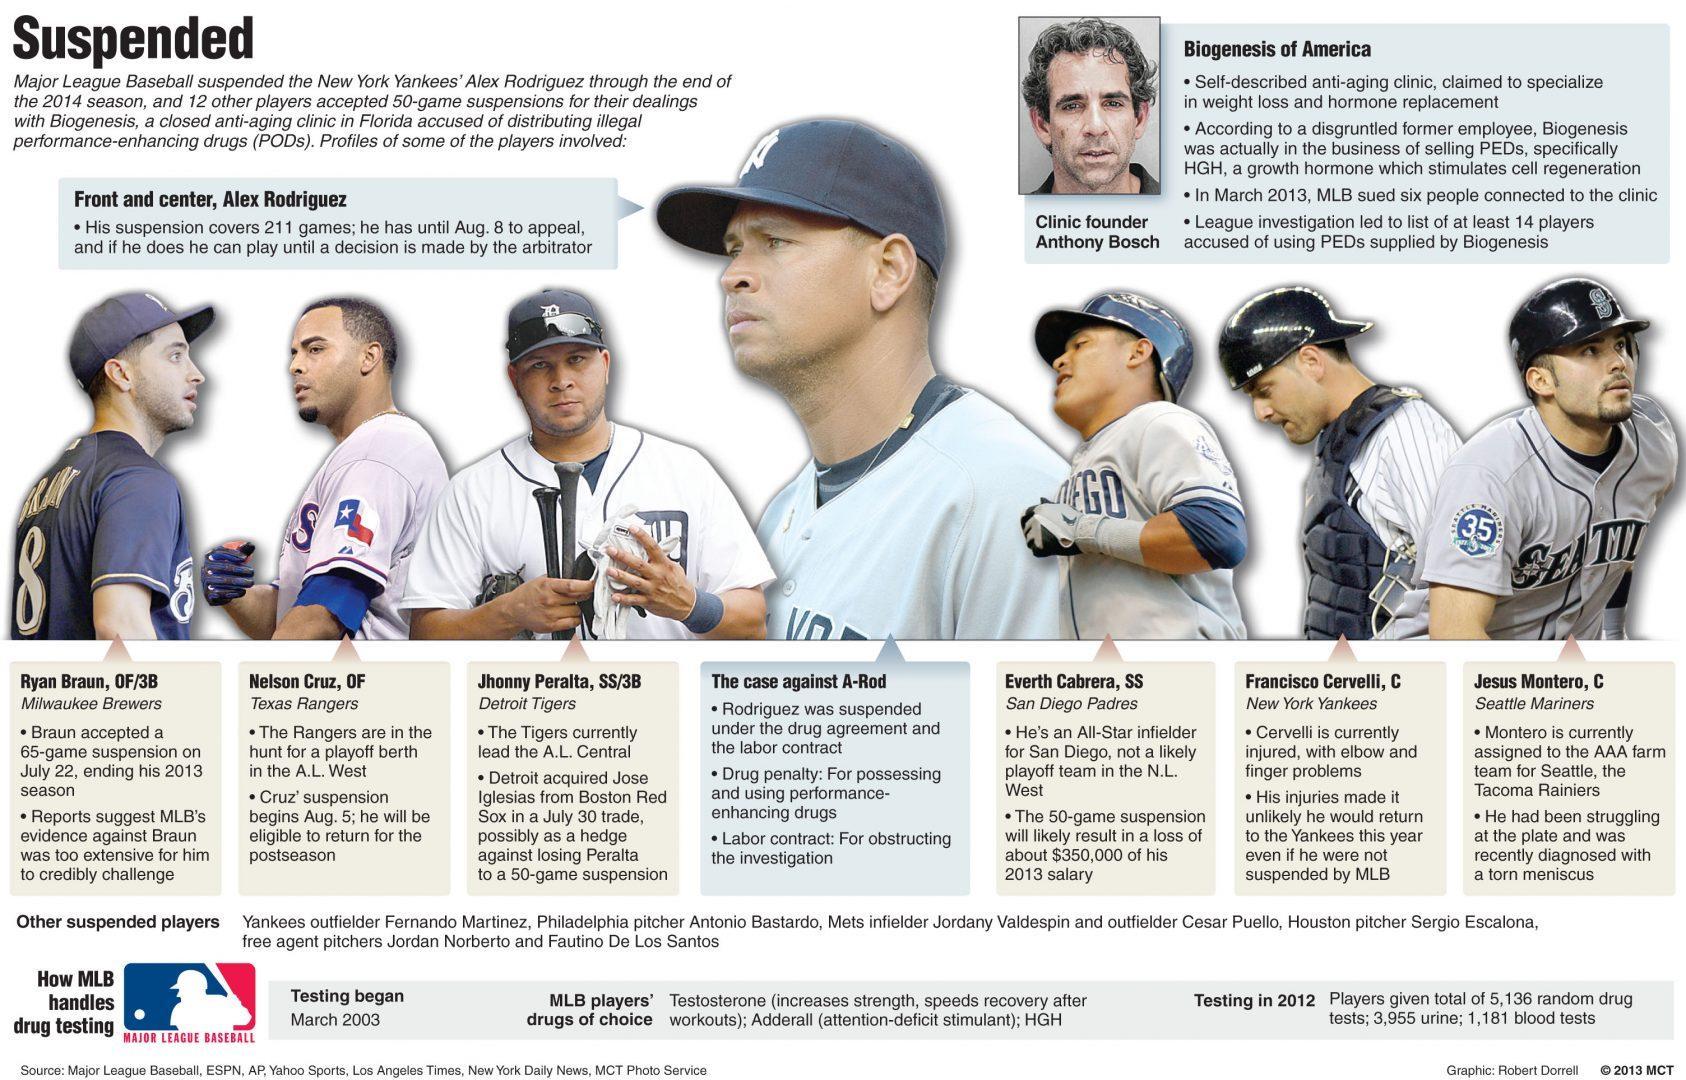 Baseball S Ped Problem Runs Deeper Than Greed